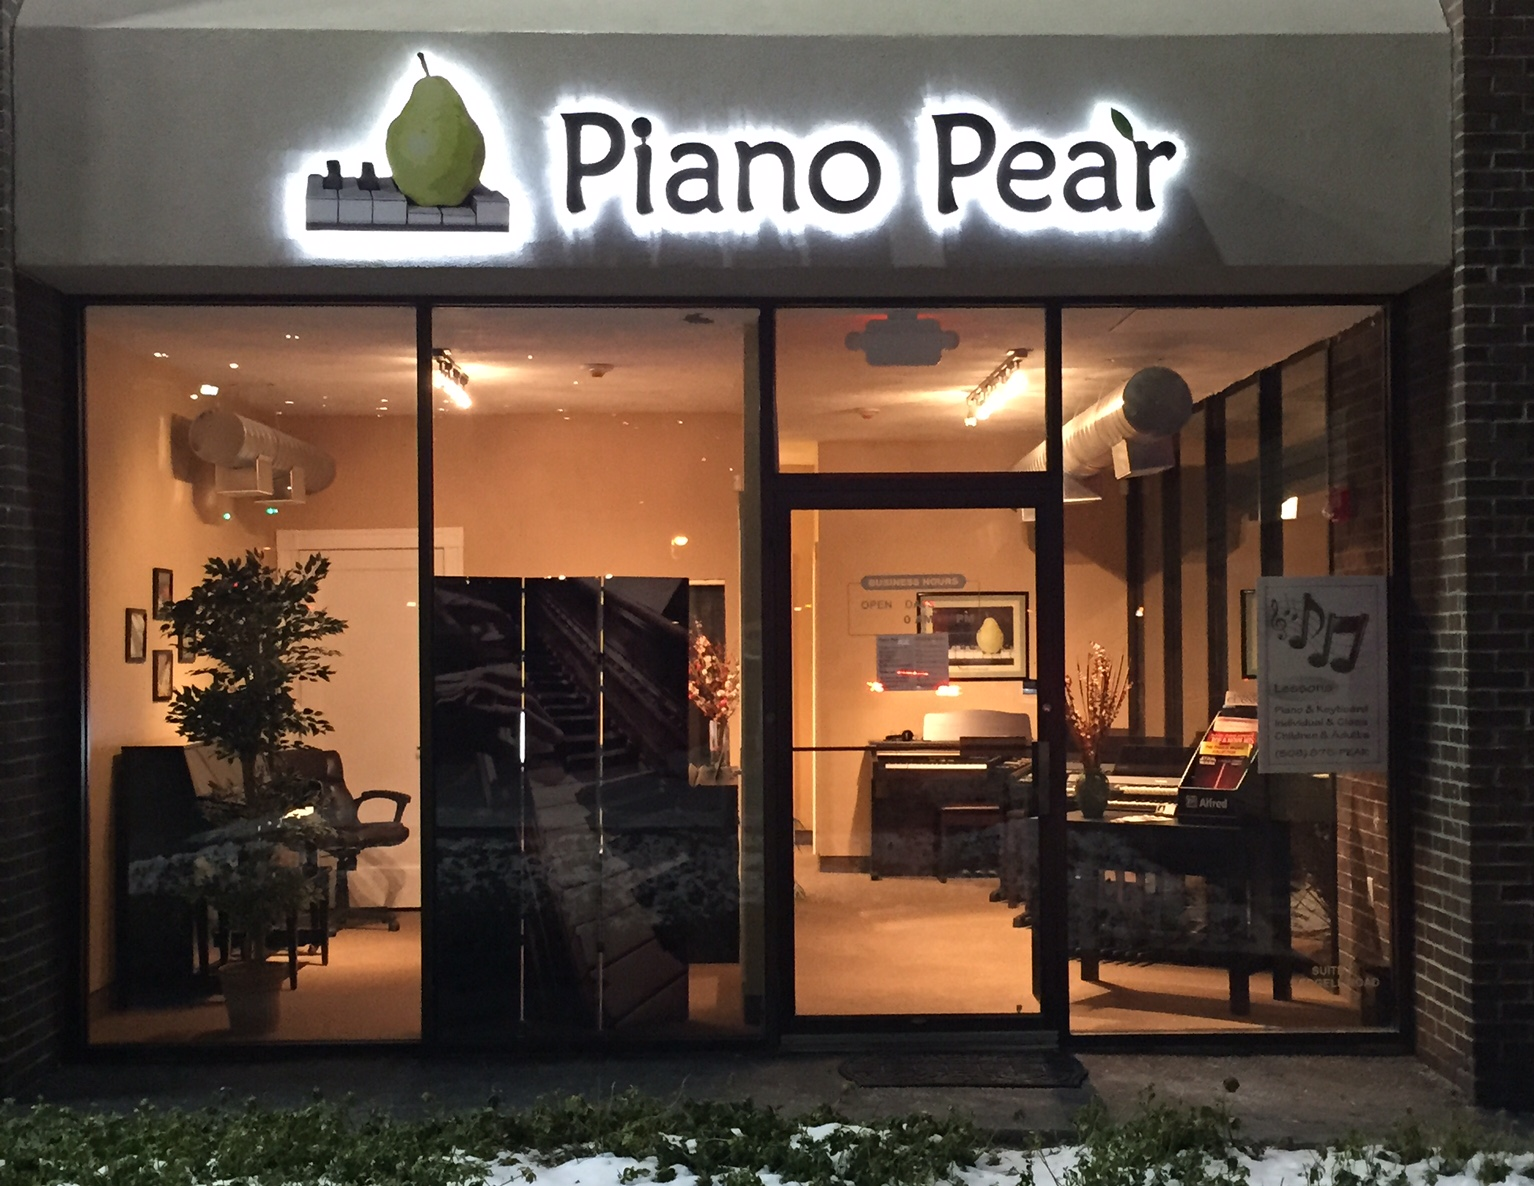 Piano Pear 2.0